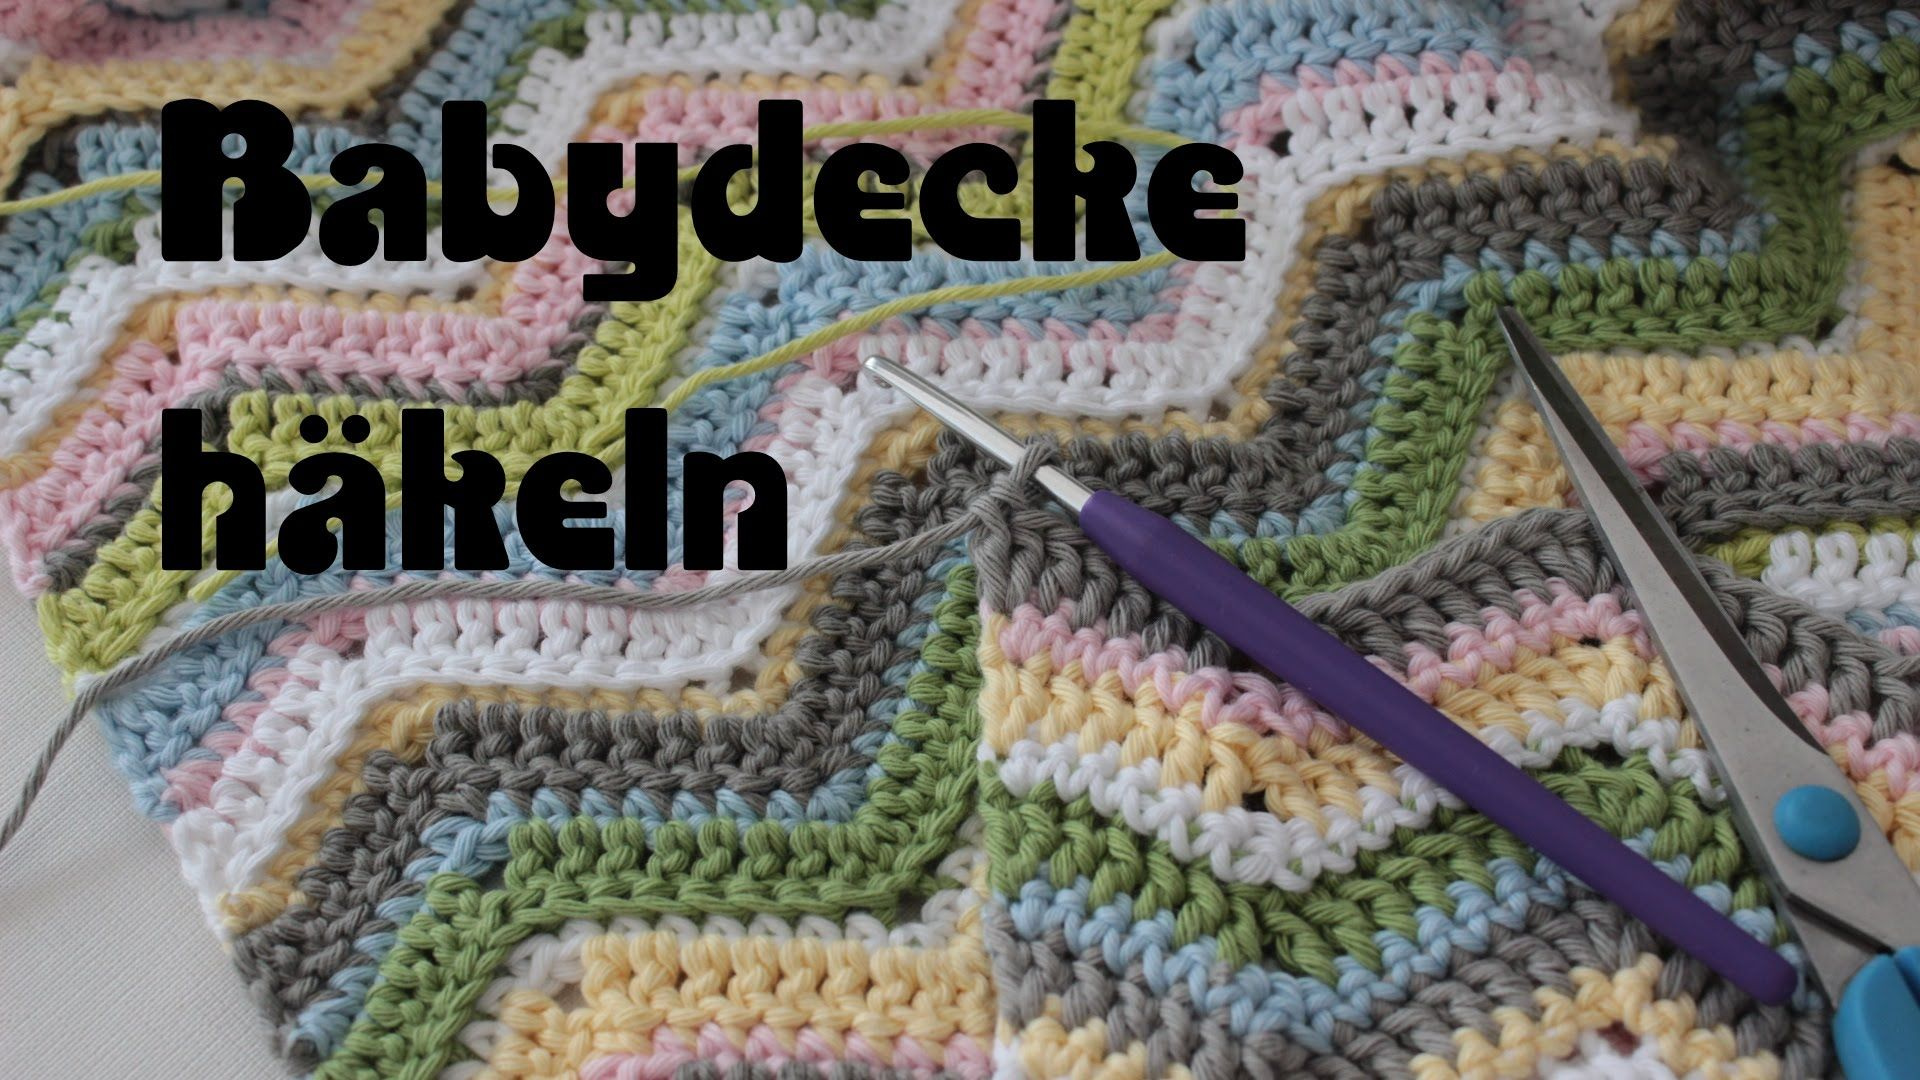 Babydecke häkeln - Zick Zack - zig zag crochet - baby blanket ...